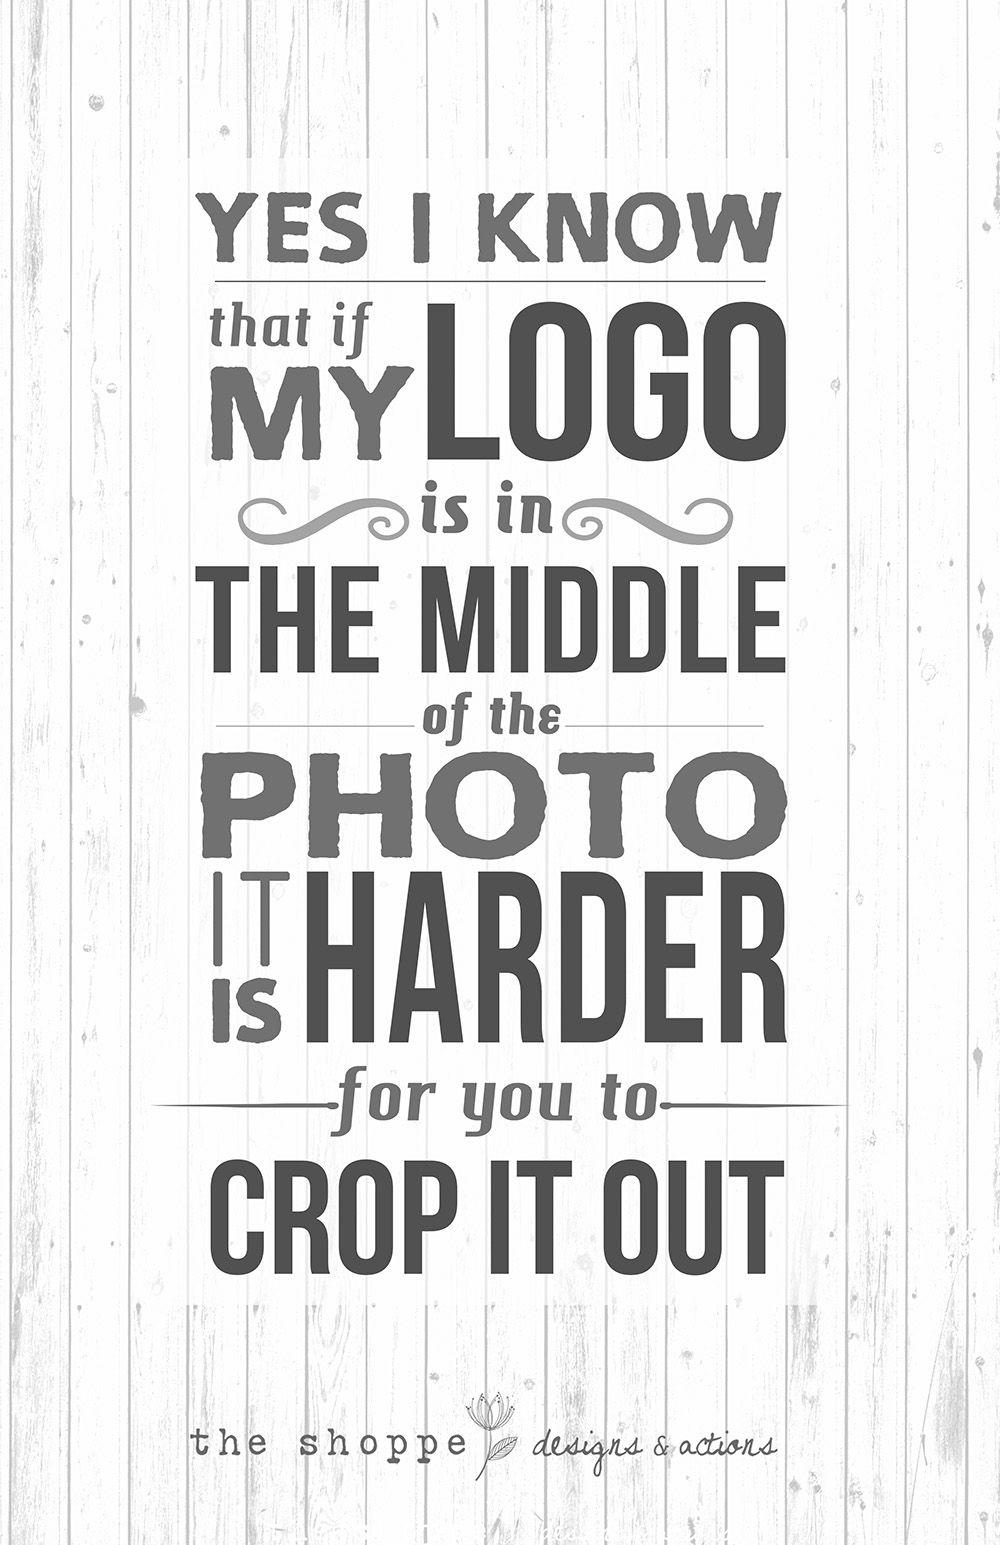 Shoppe Satire Humor For Photographers In 2020 Photography Quotes Funny Quotes About Photography Photographer Humor